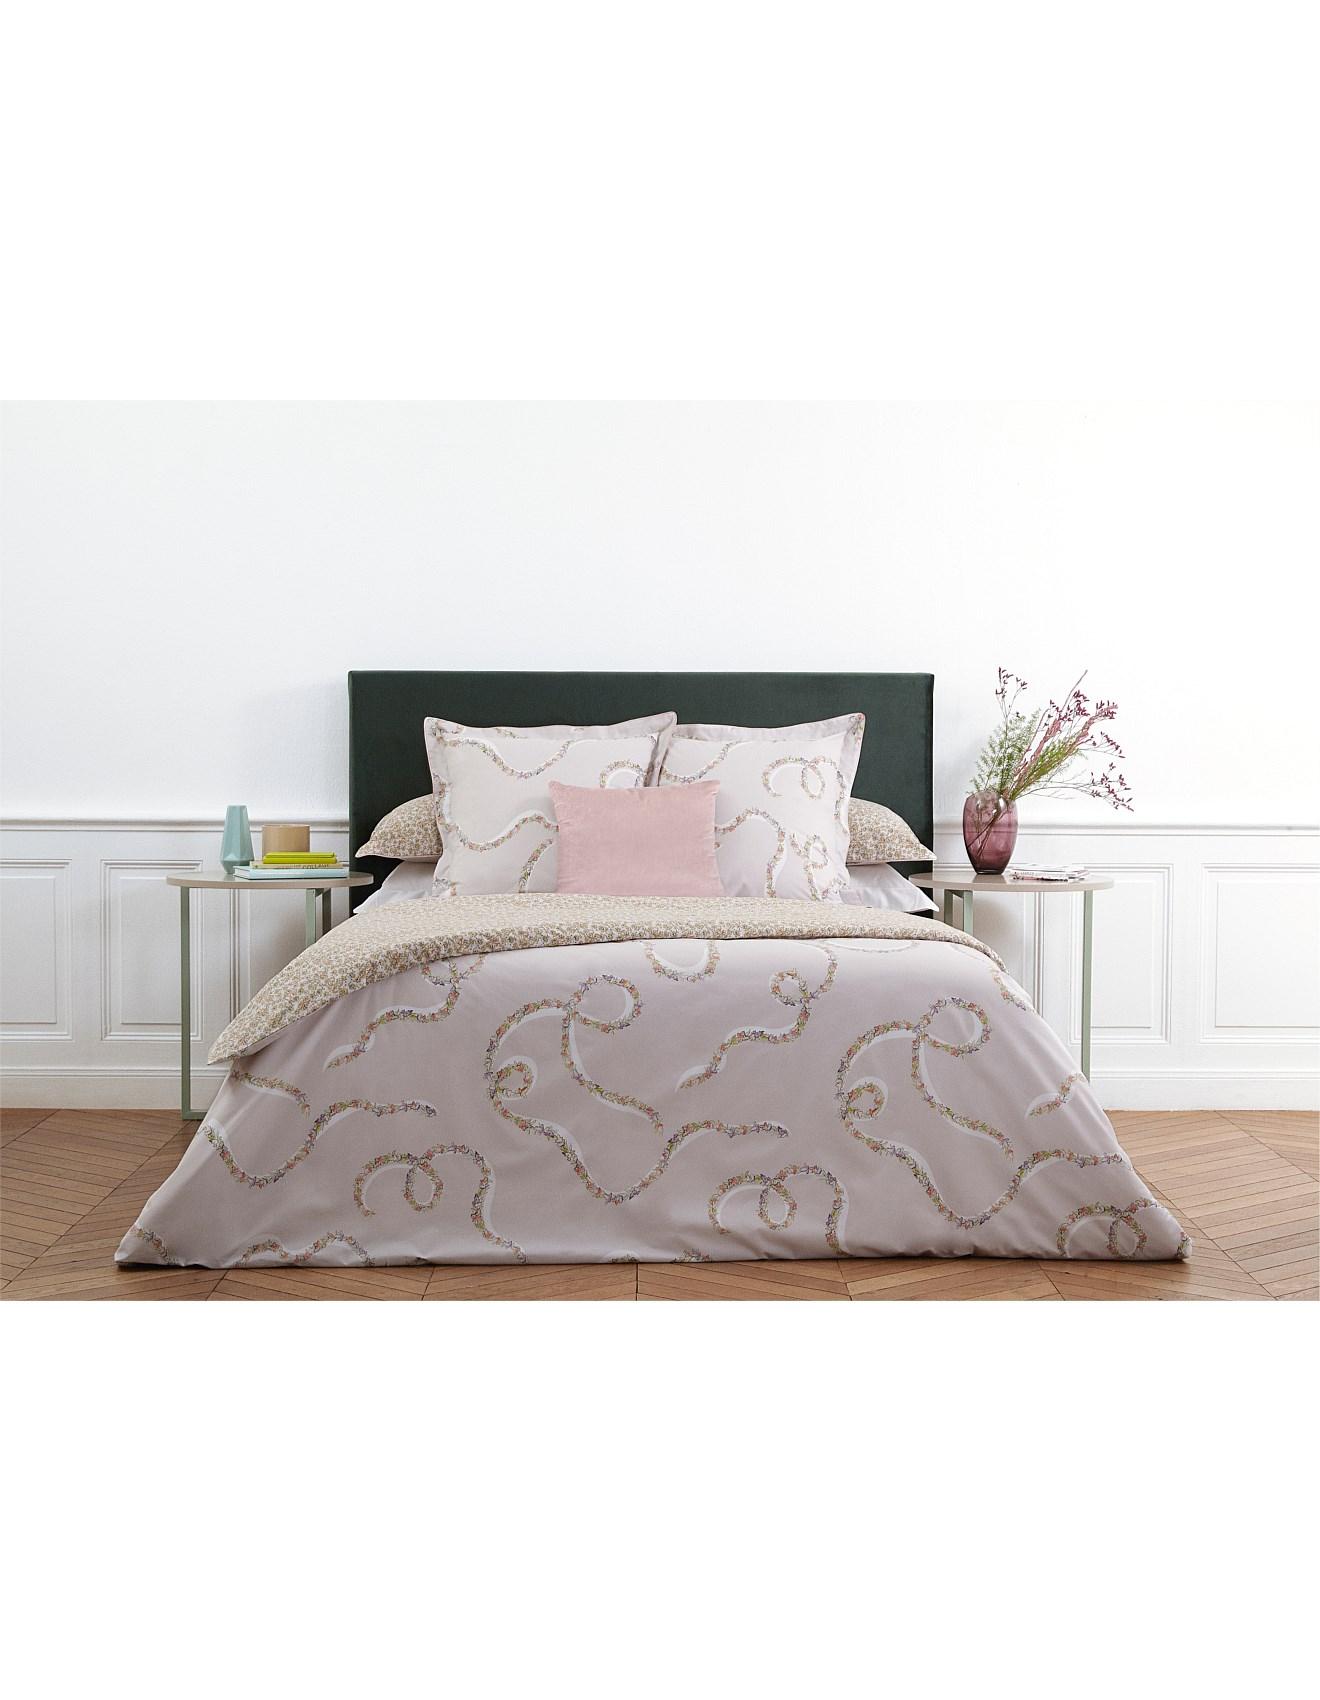 Bed Linen Galons Single Bed Flat Sheet